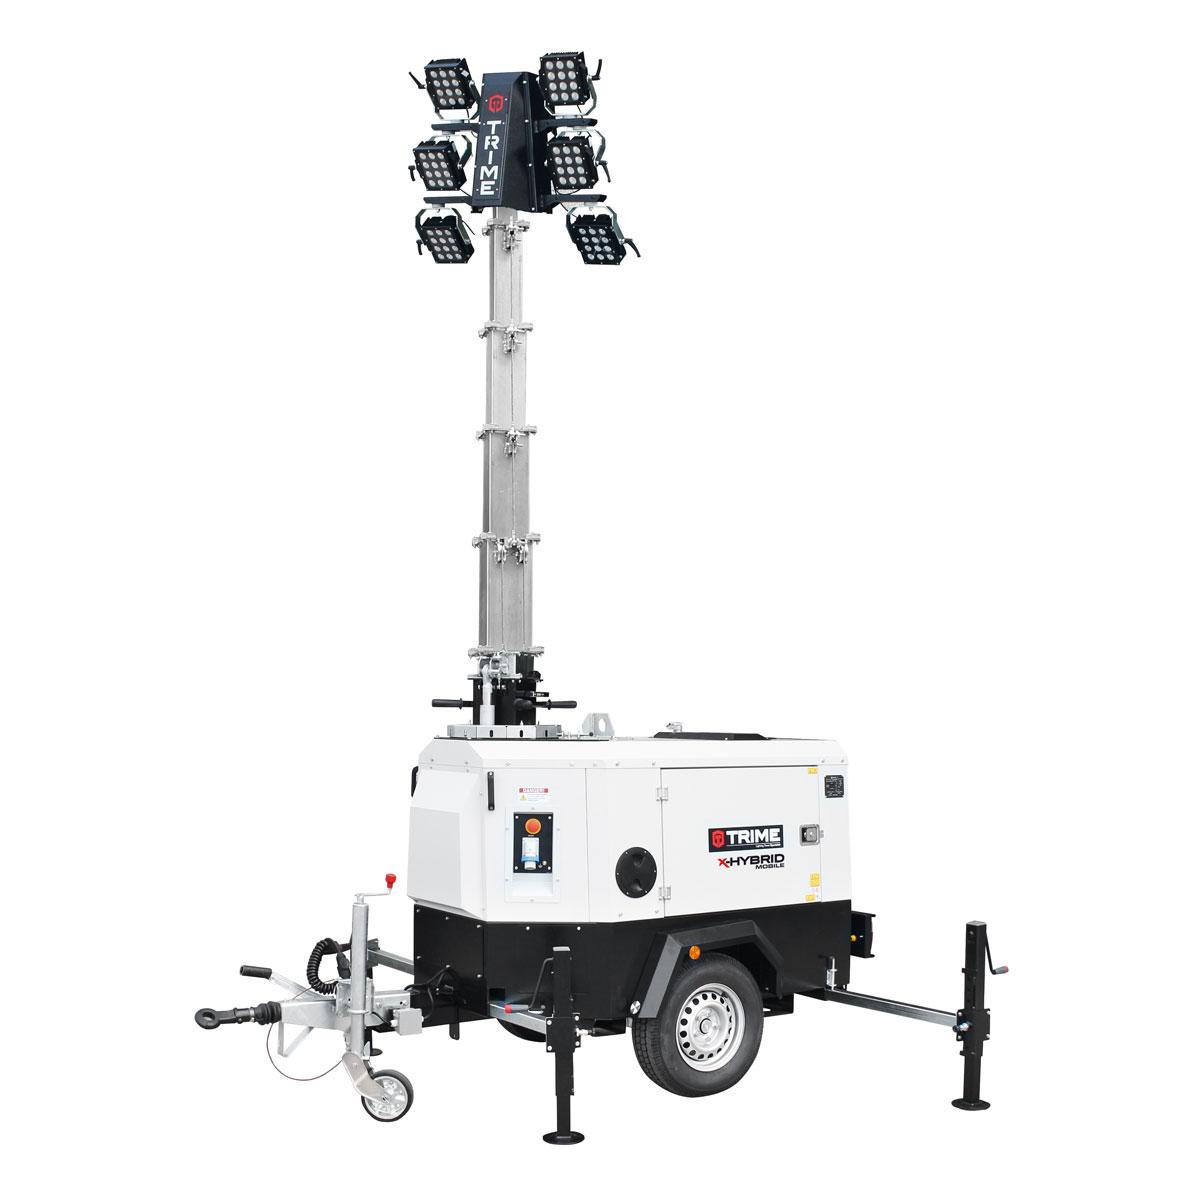 belysningsmast-led-x-hybrid-mobil-6x150W